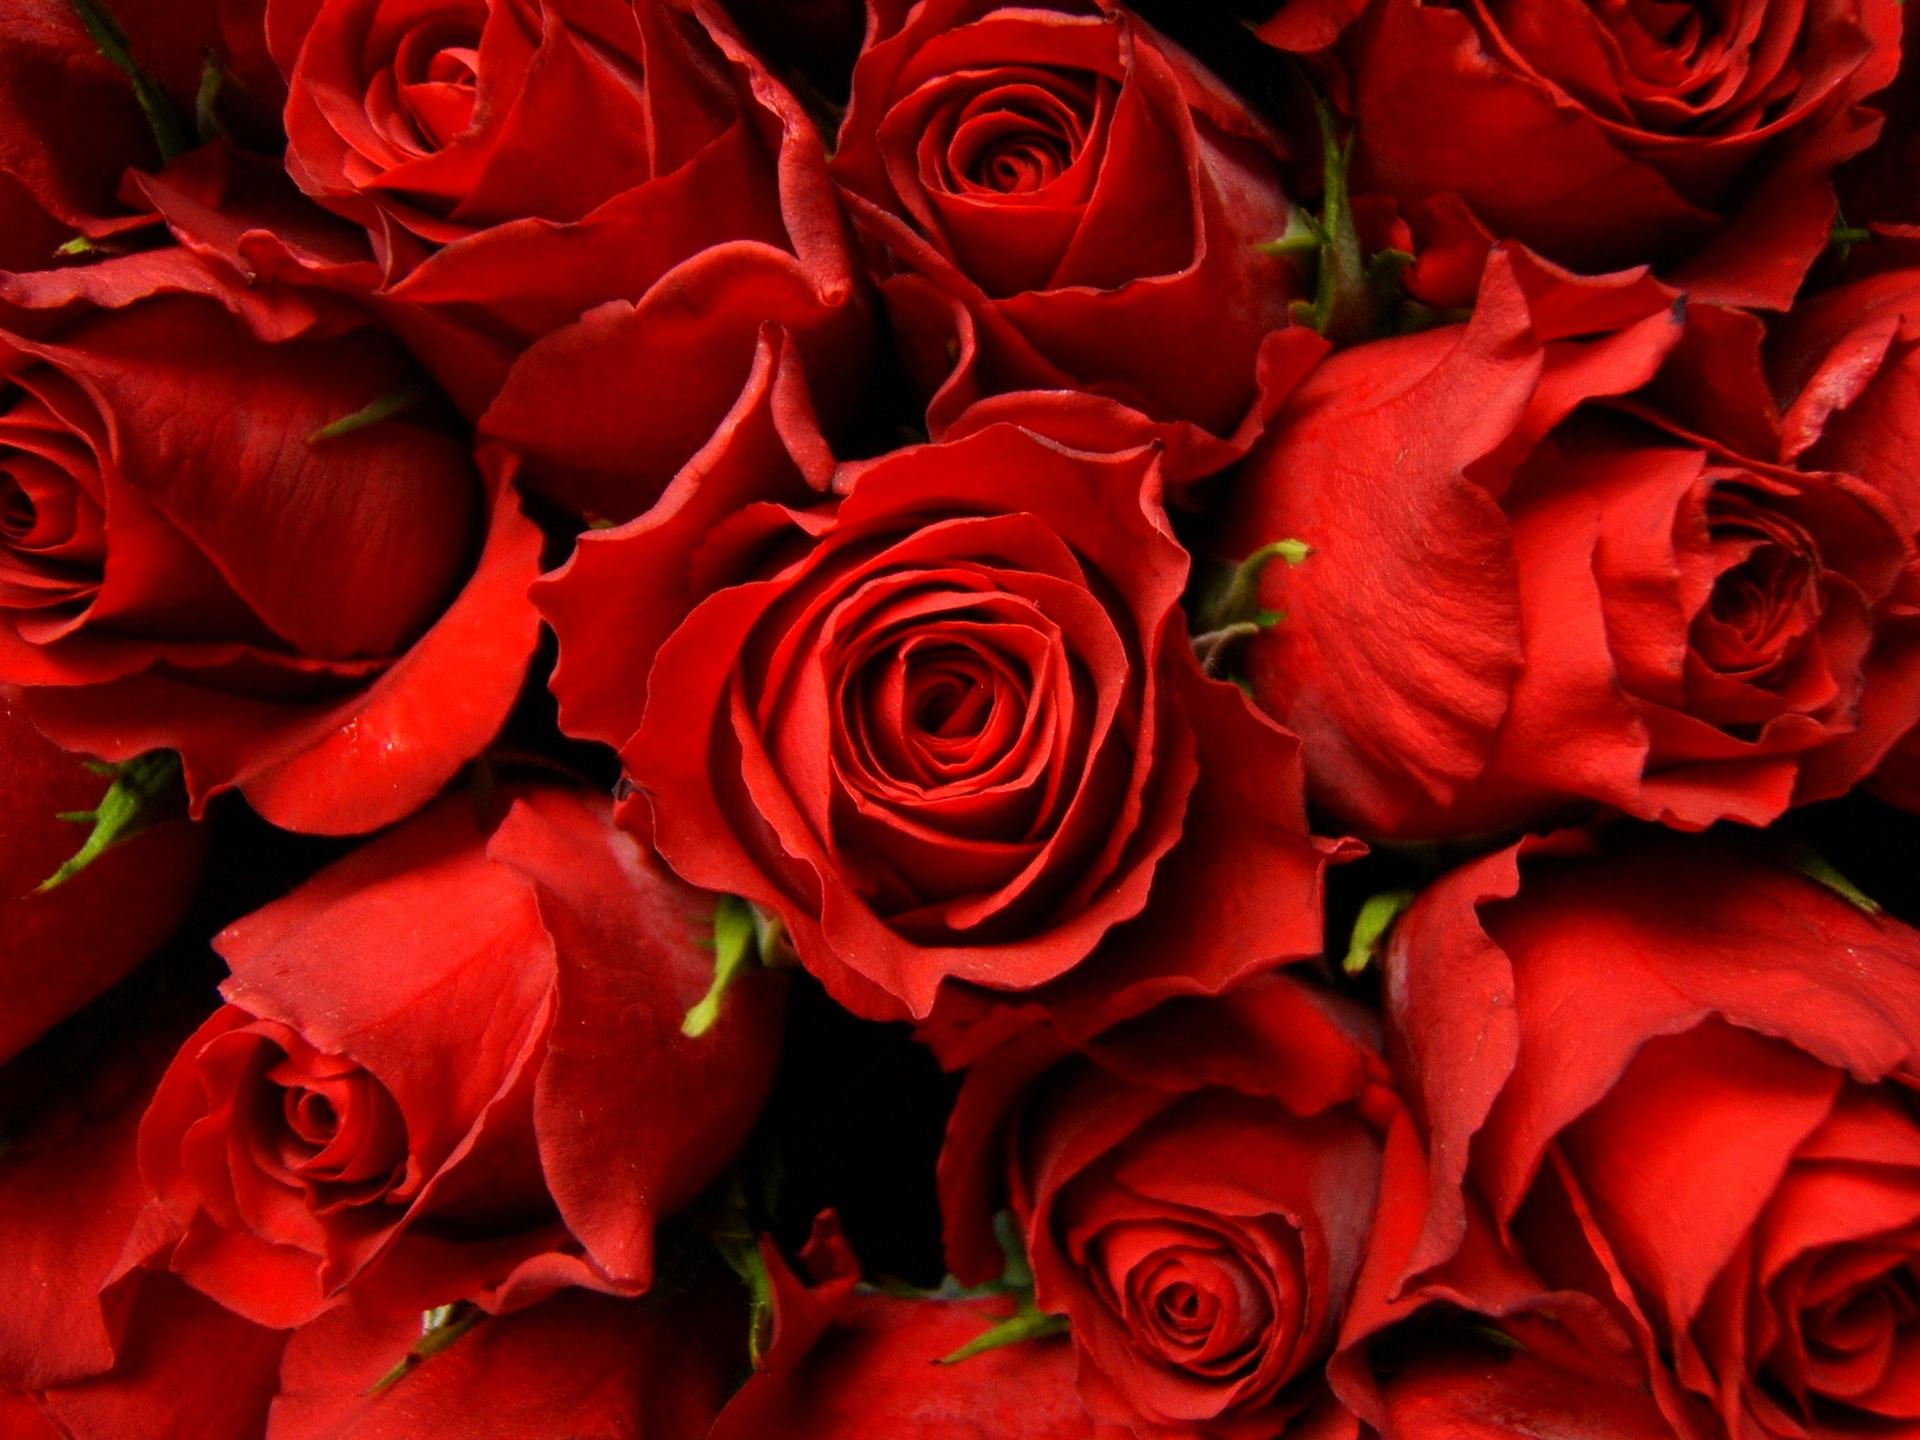 Red roses wallpaper Wallpaper Wide HD 1920x1440